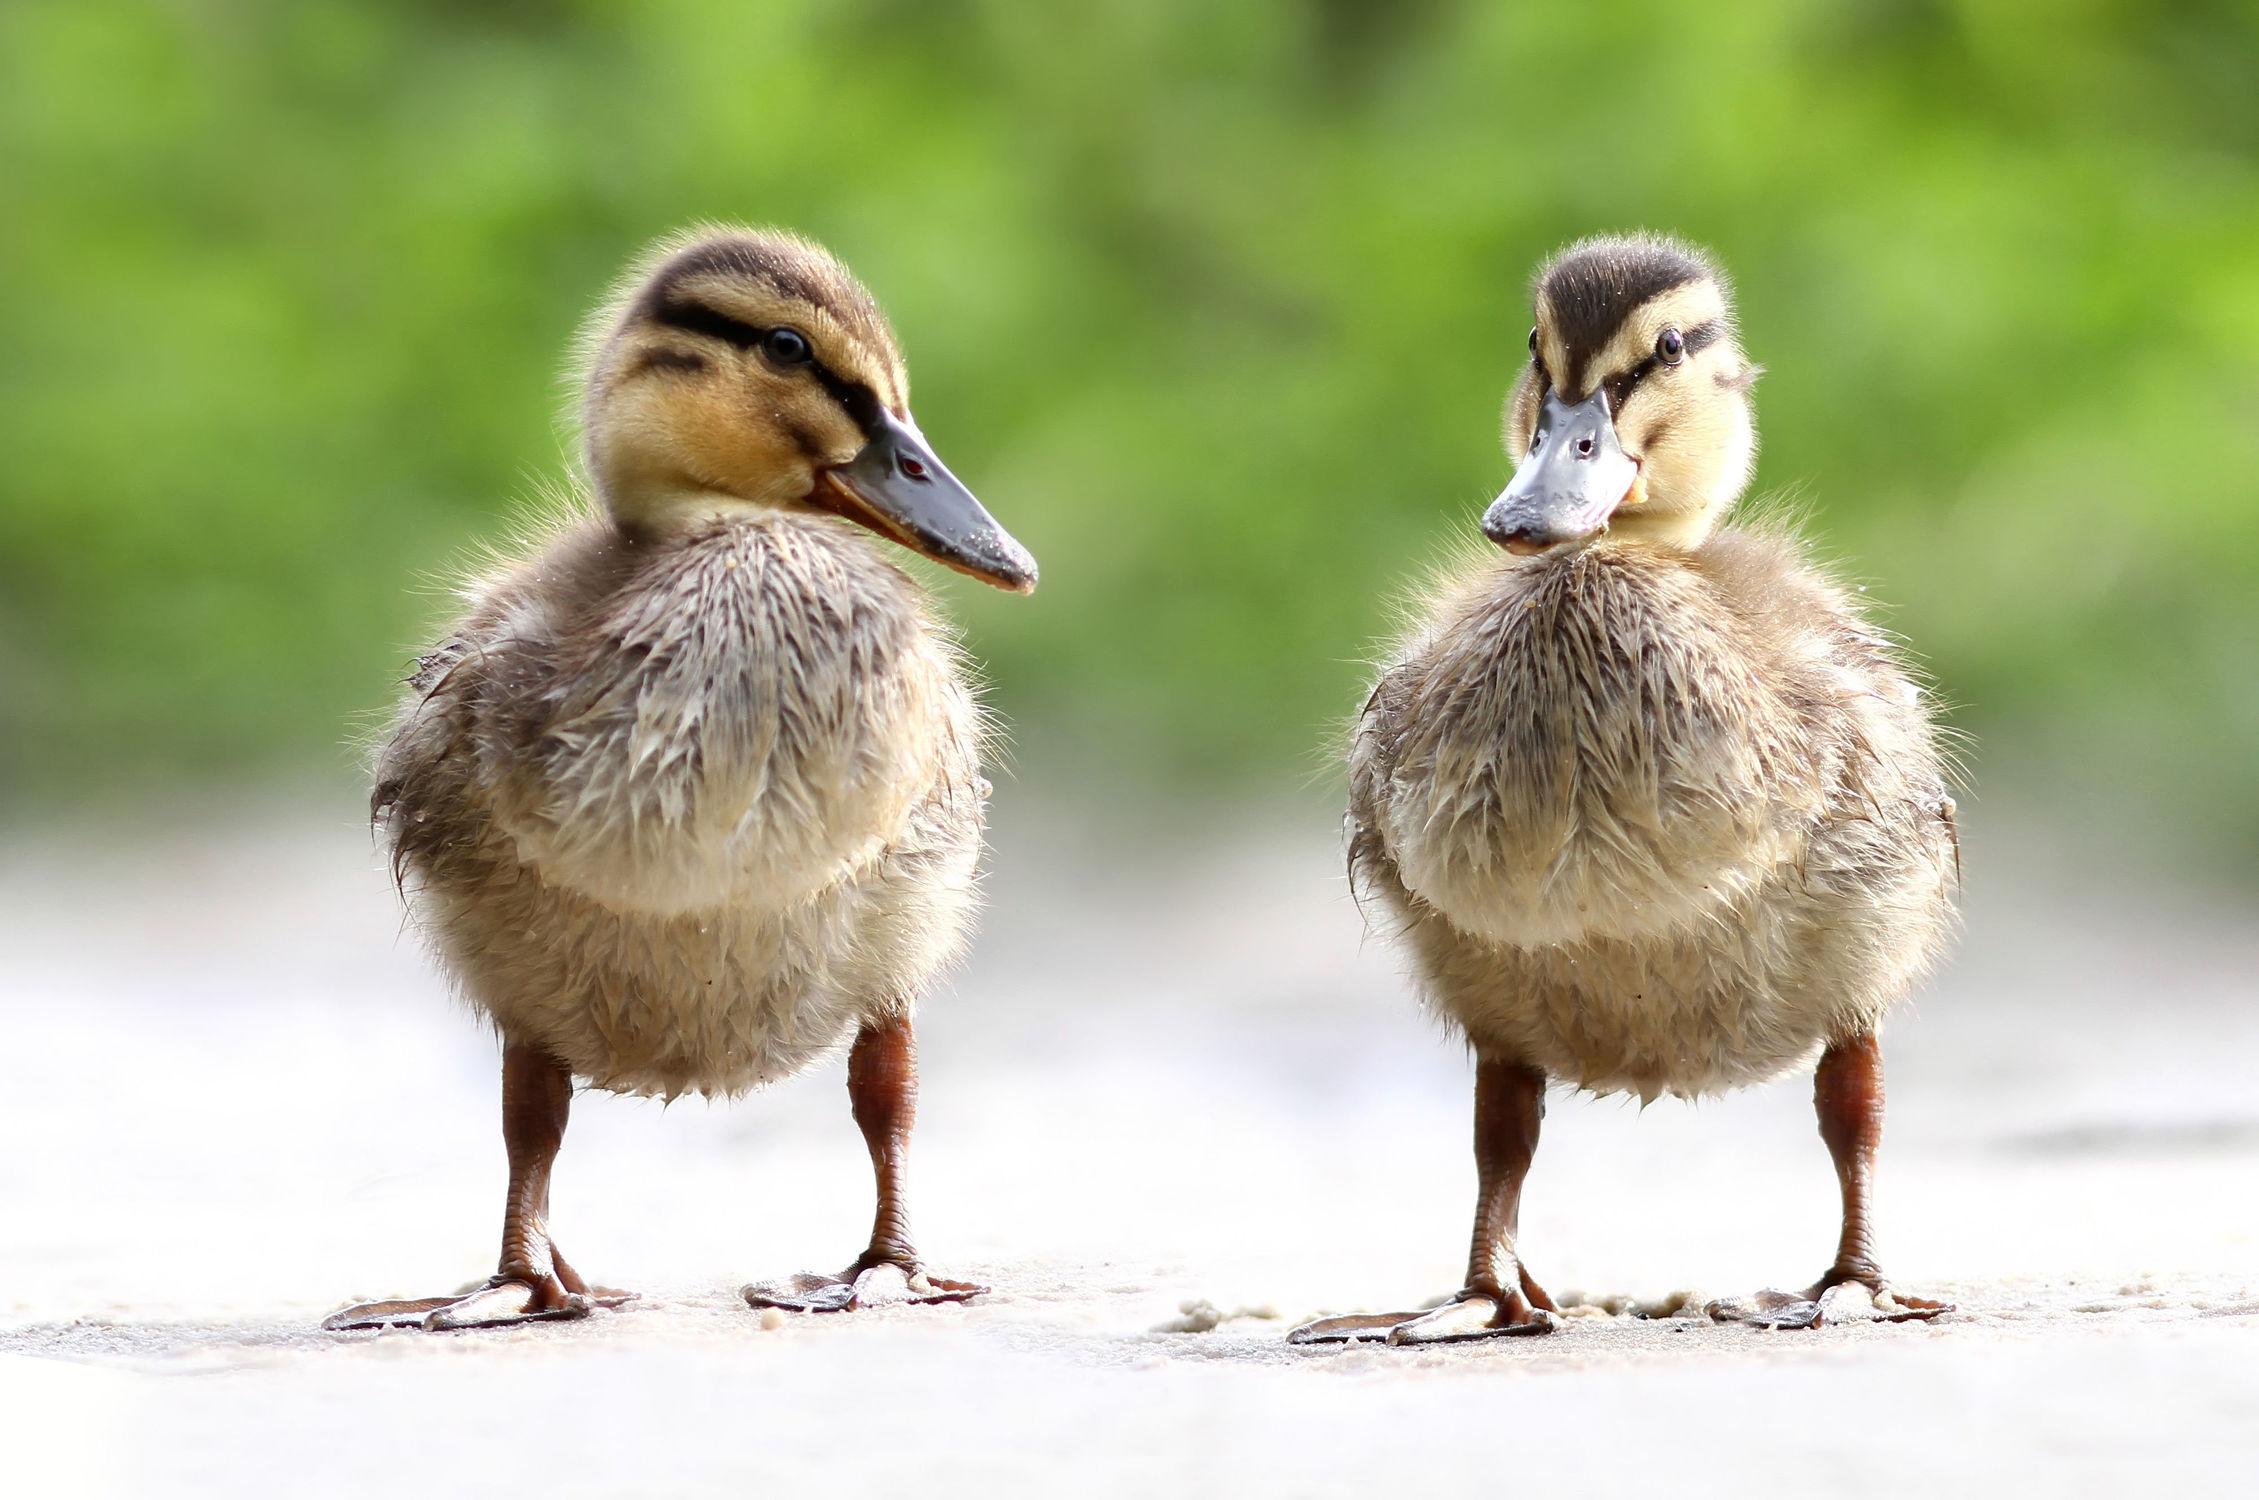 Bild mit Tiere, Natur, Vögel, Vögel, Enten, Tier, Ente, Stockente